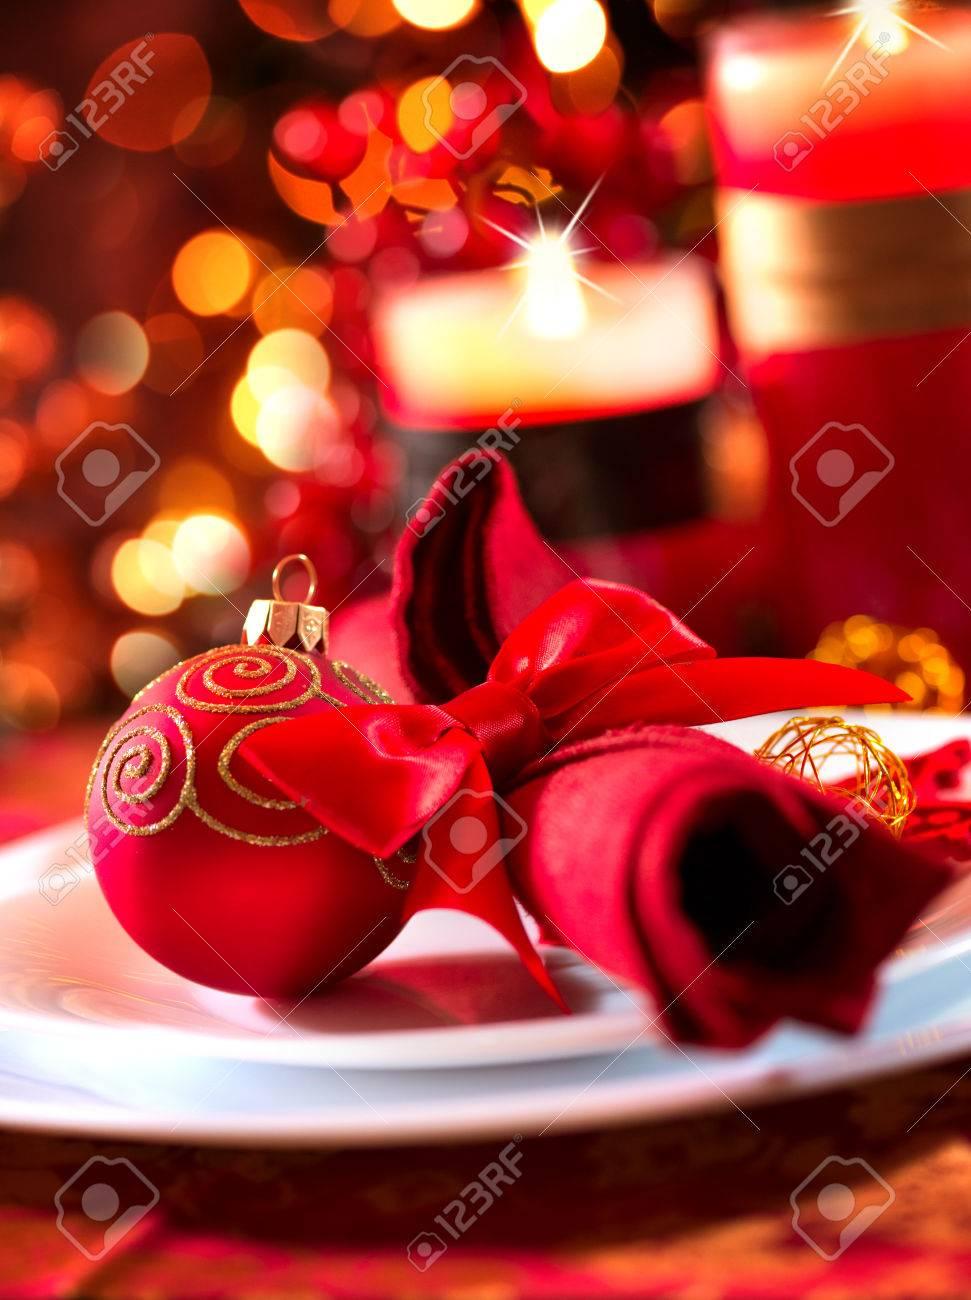 Christmas And New Year Holiday Table Setting  Celebration Stock Photo - 23536820